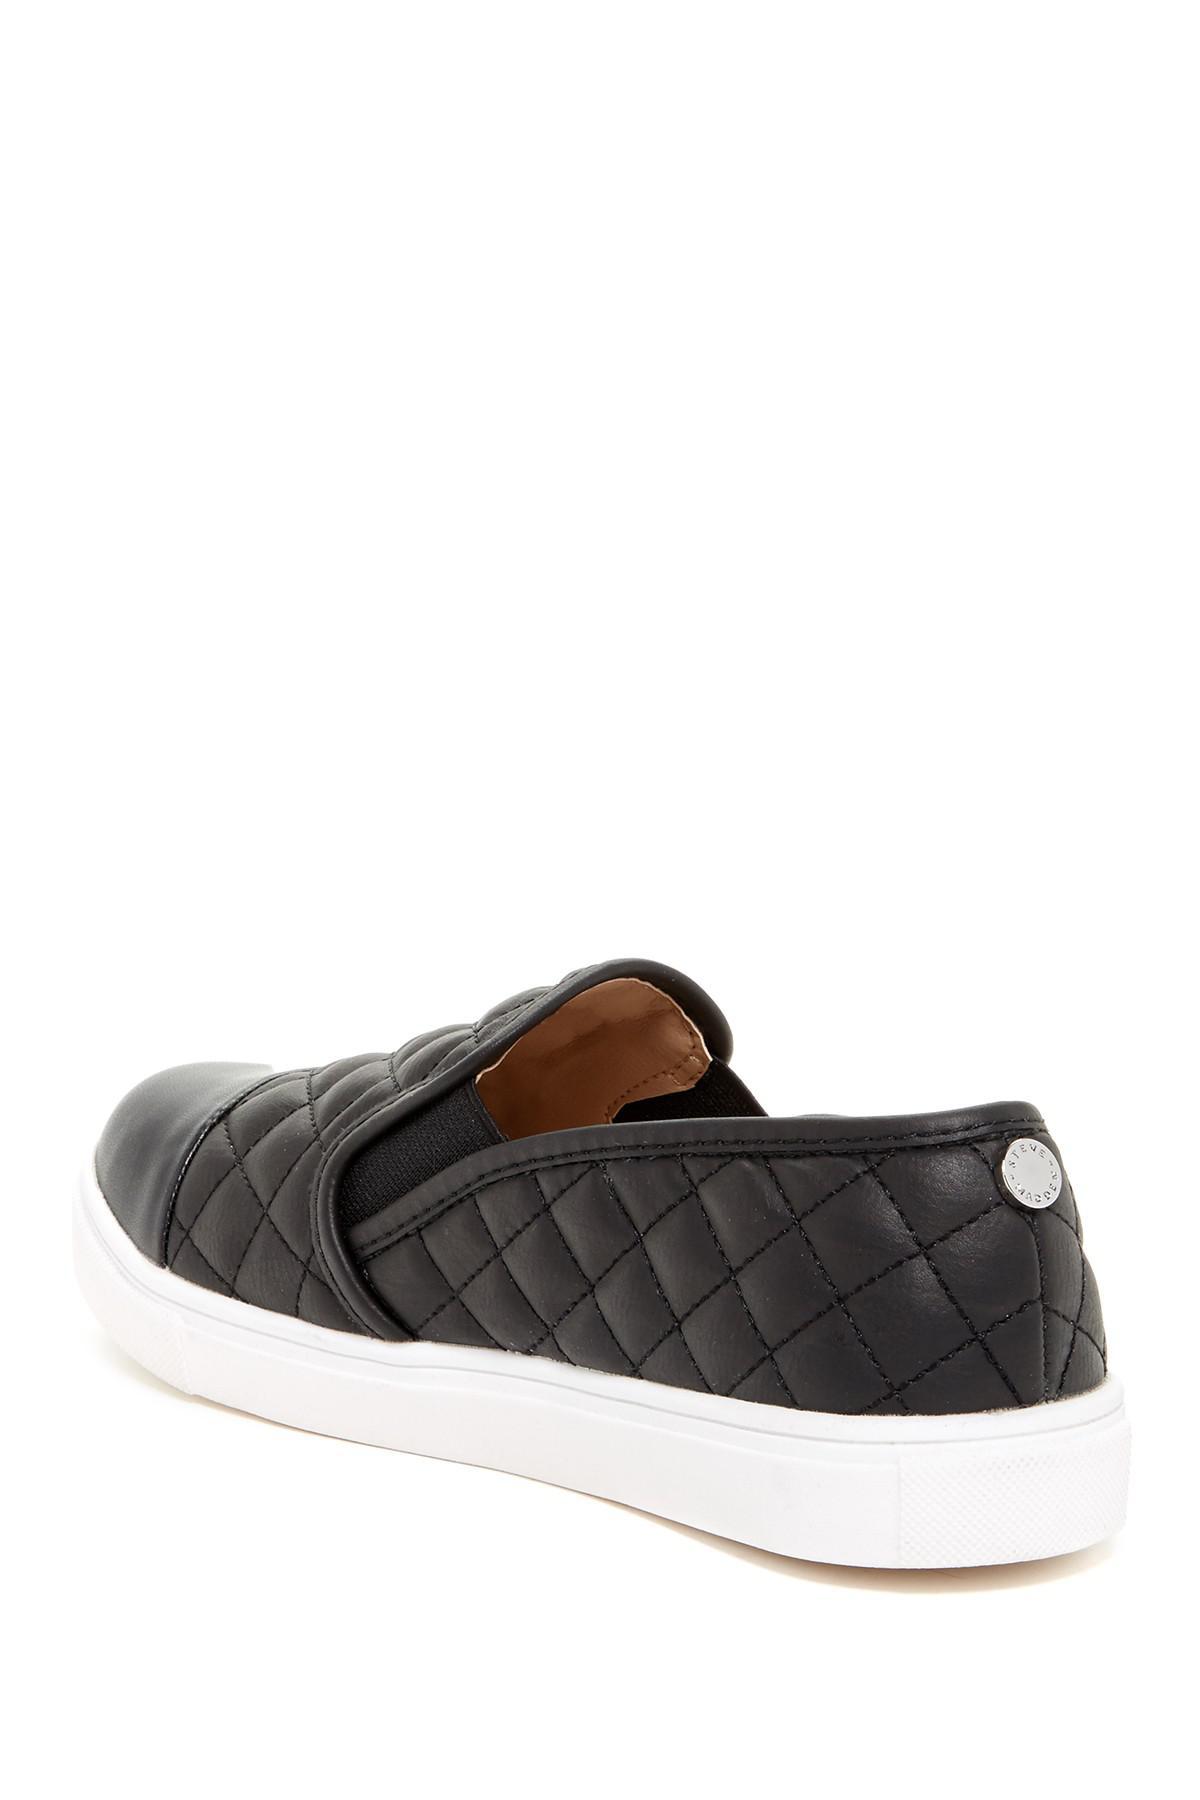 4a3eb81f209 Steve Madden - Black Zaander Slip-on Sneaker - Lyst. View fullscreen